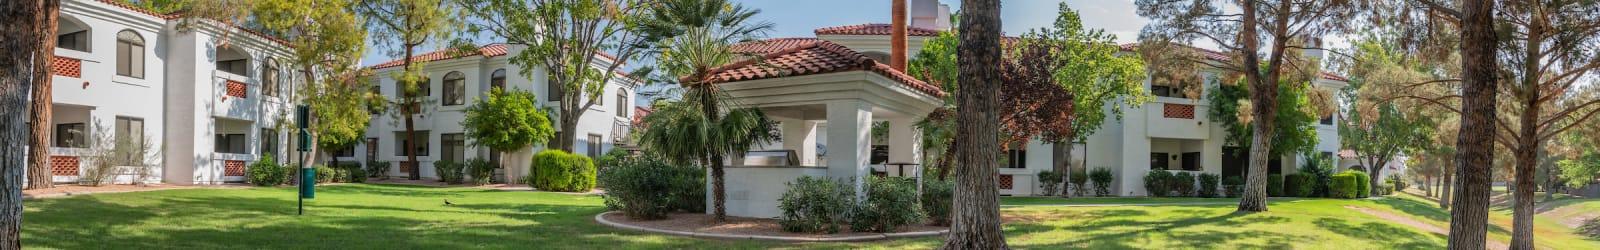 Apply now at San Antigua in McCormick Ranch in Scottsdale, Arizona